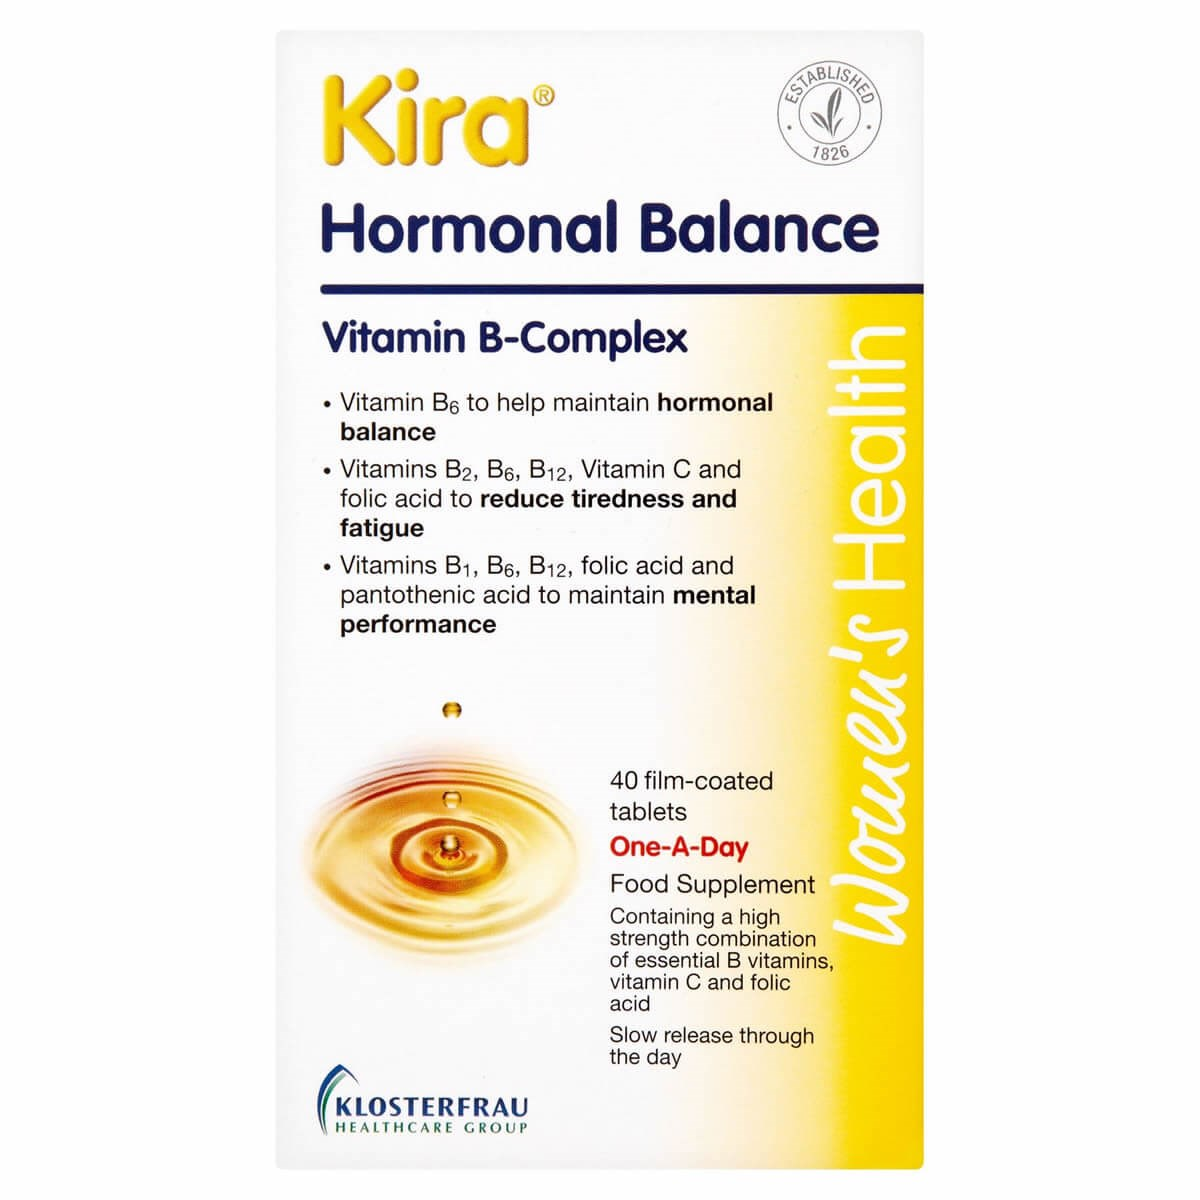 Kira Hormonal Balance Vitamin B-Complex